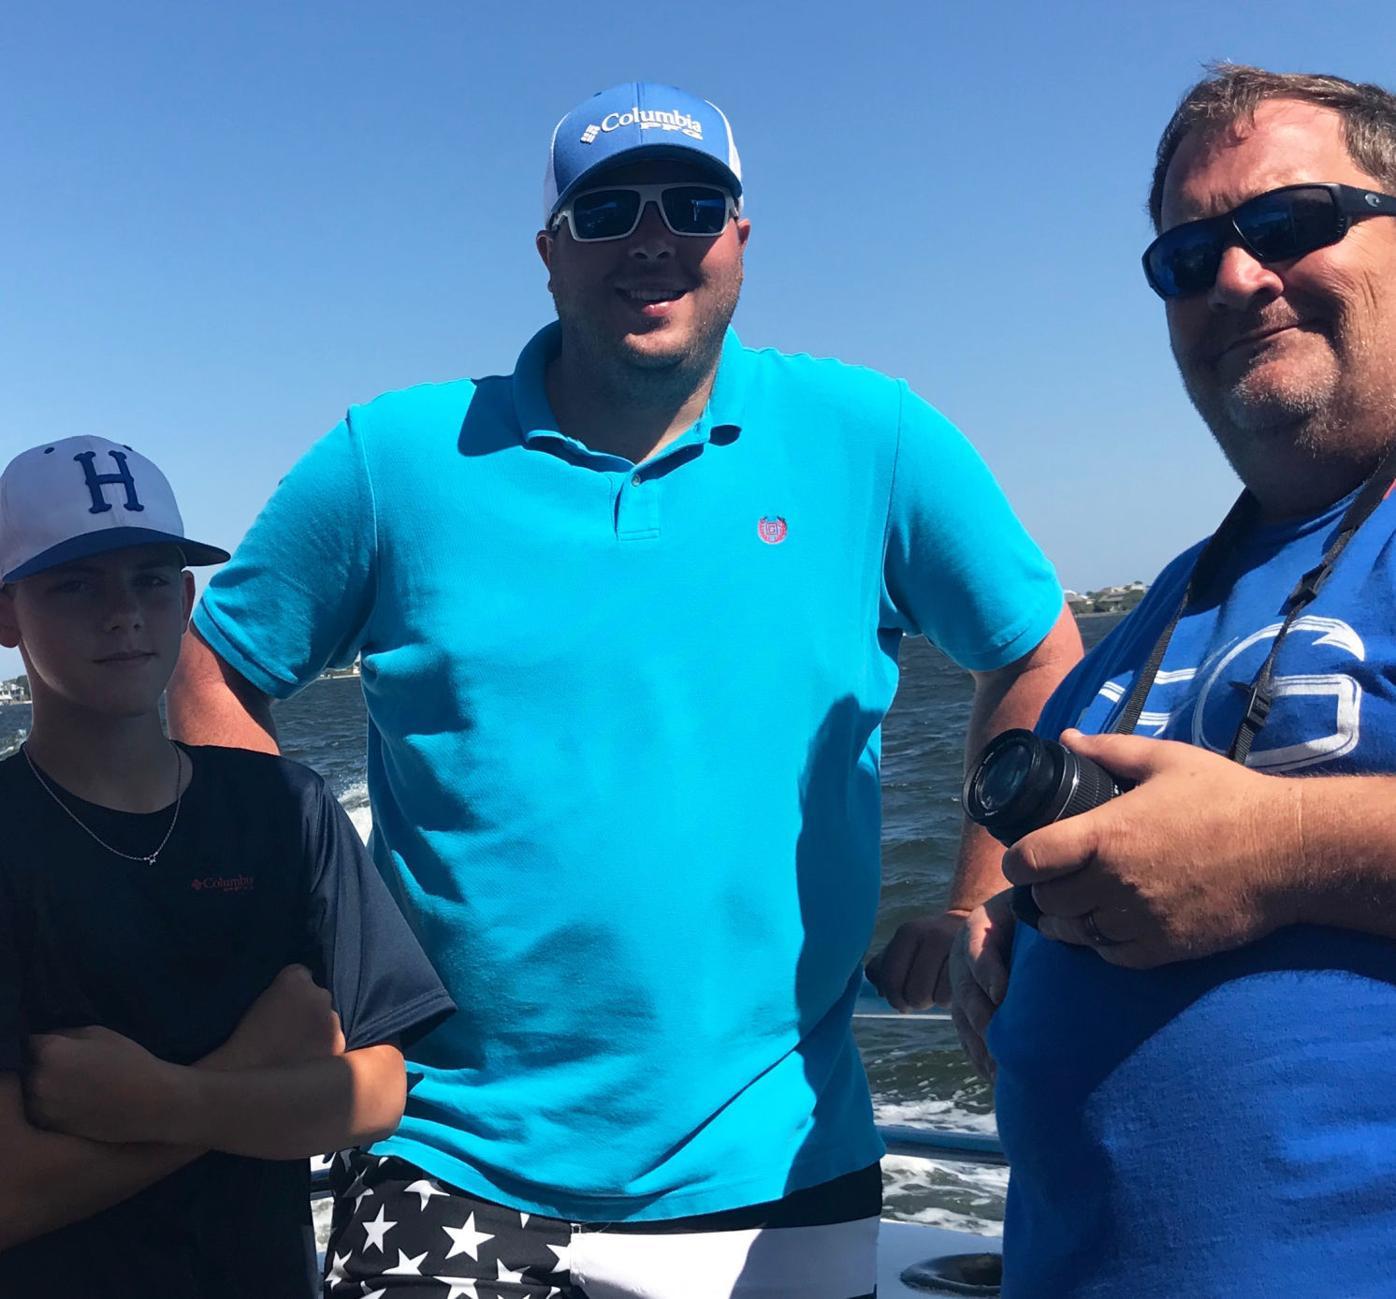 mcj-2019-06-26-bacteria-dolphin-cruise